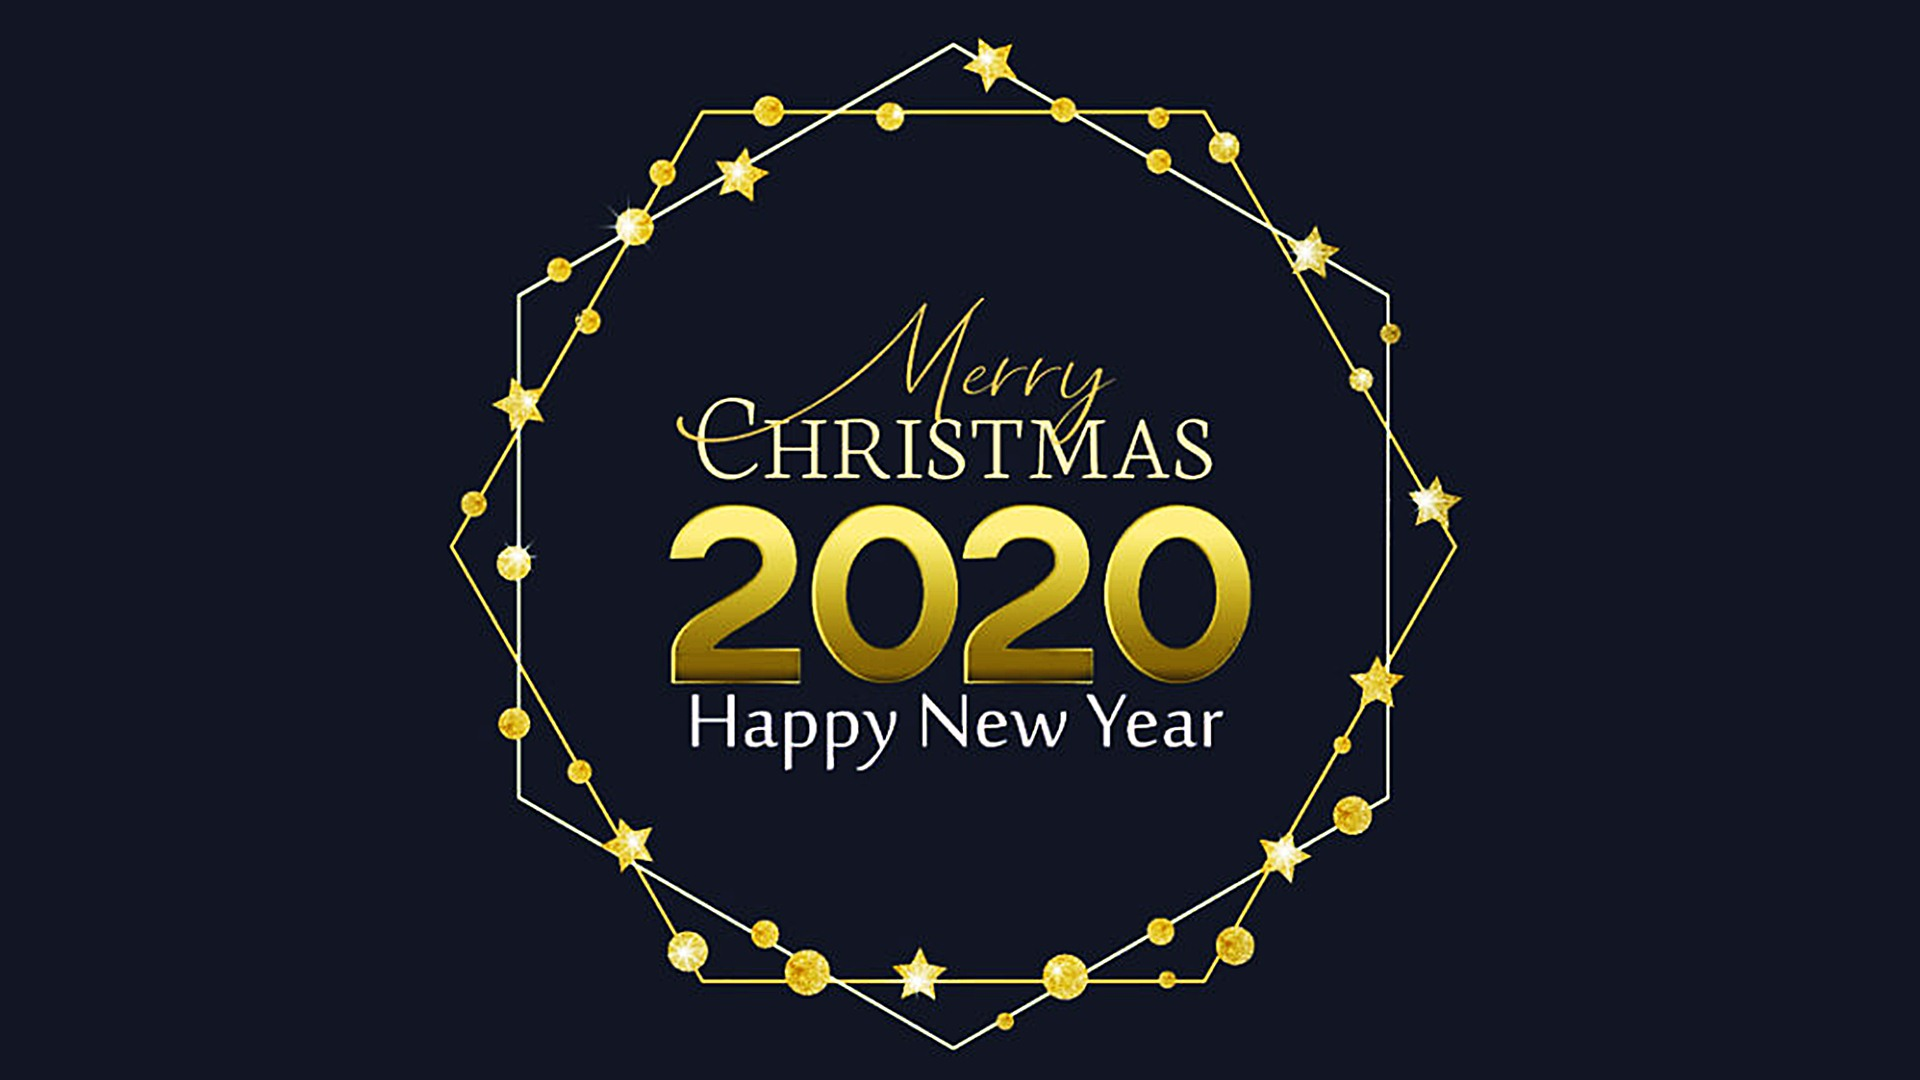 35 happy new year 2020 wallpapers on wallpapersafari 35 happy new year 2020 wallpapers on